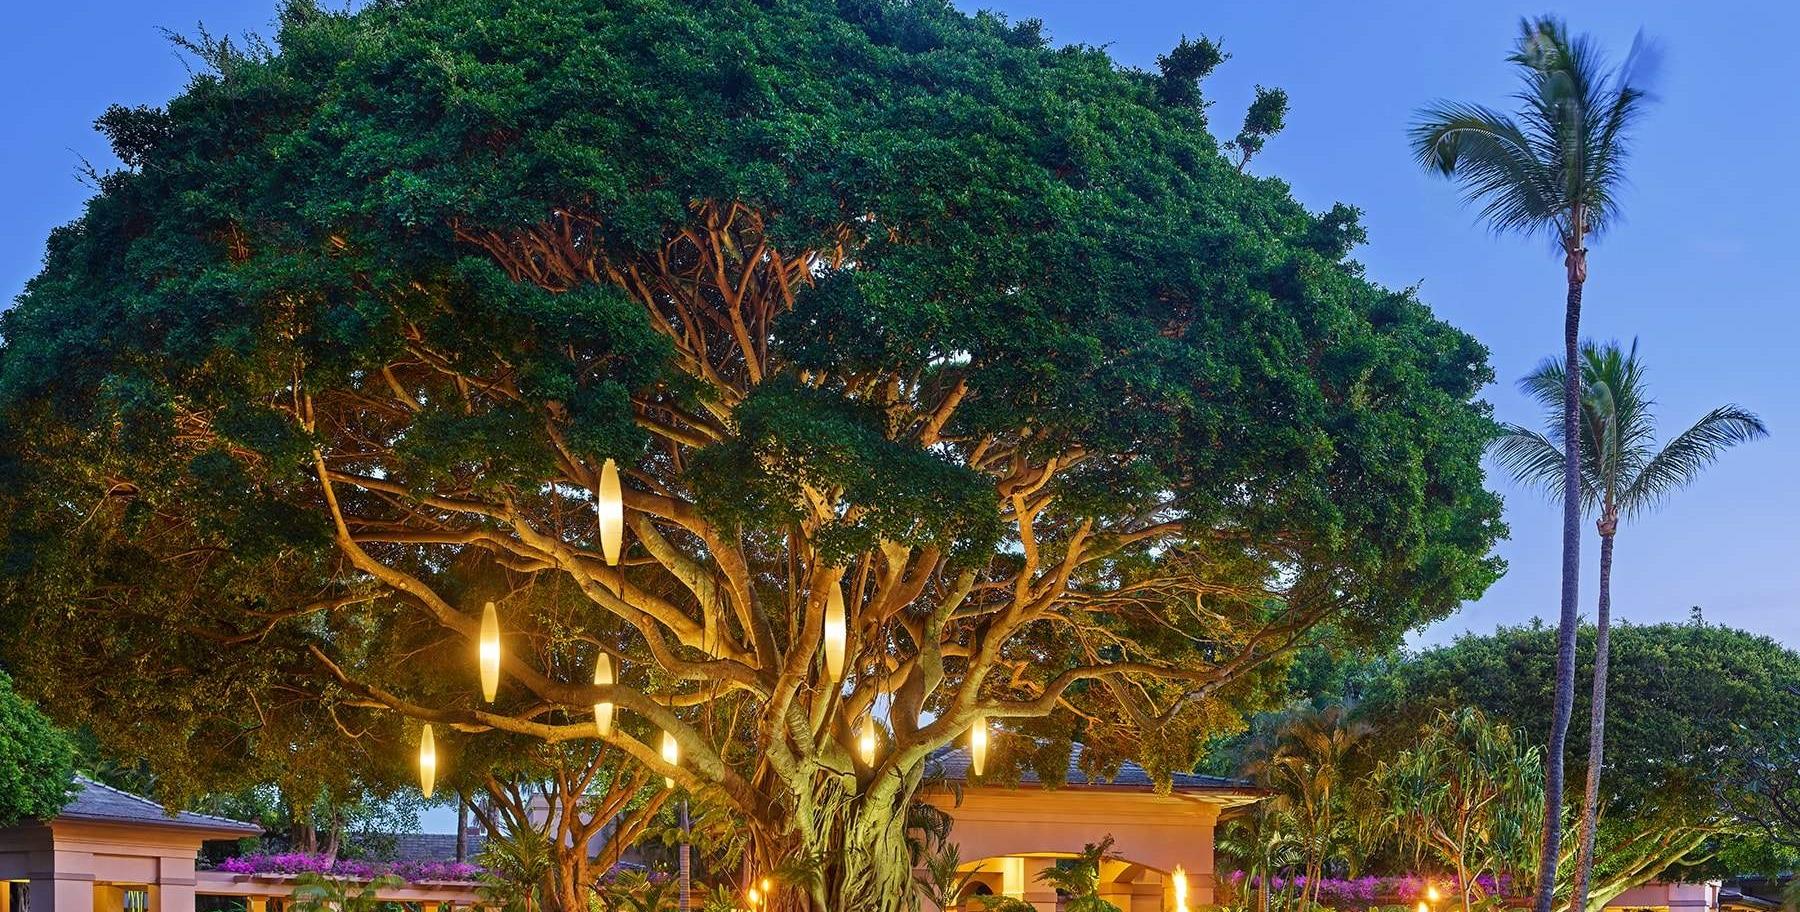 Banyan Tree located at the iconic Ritz-Carlton, Kapalua on Maui